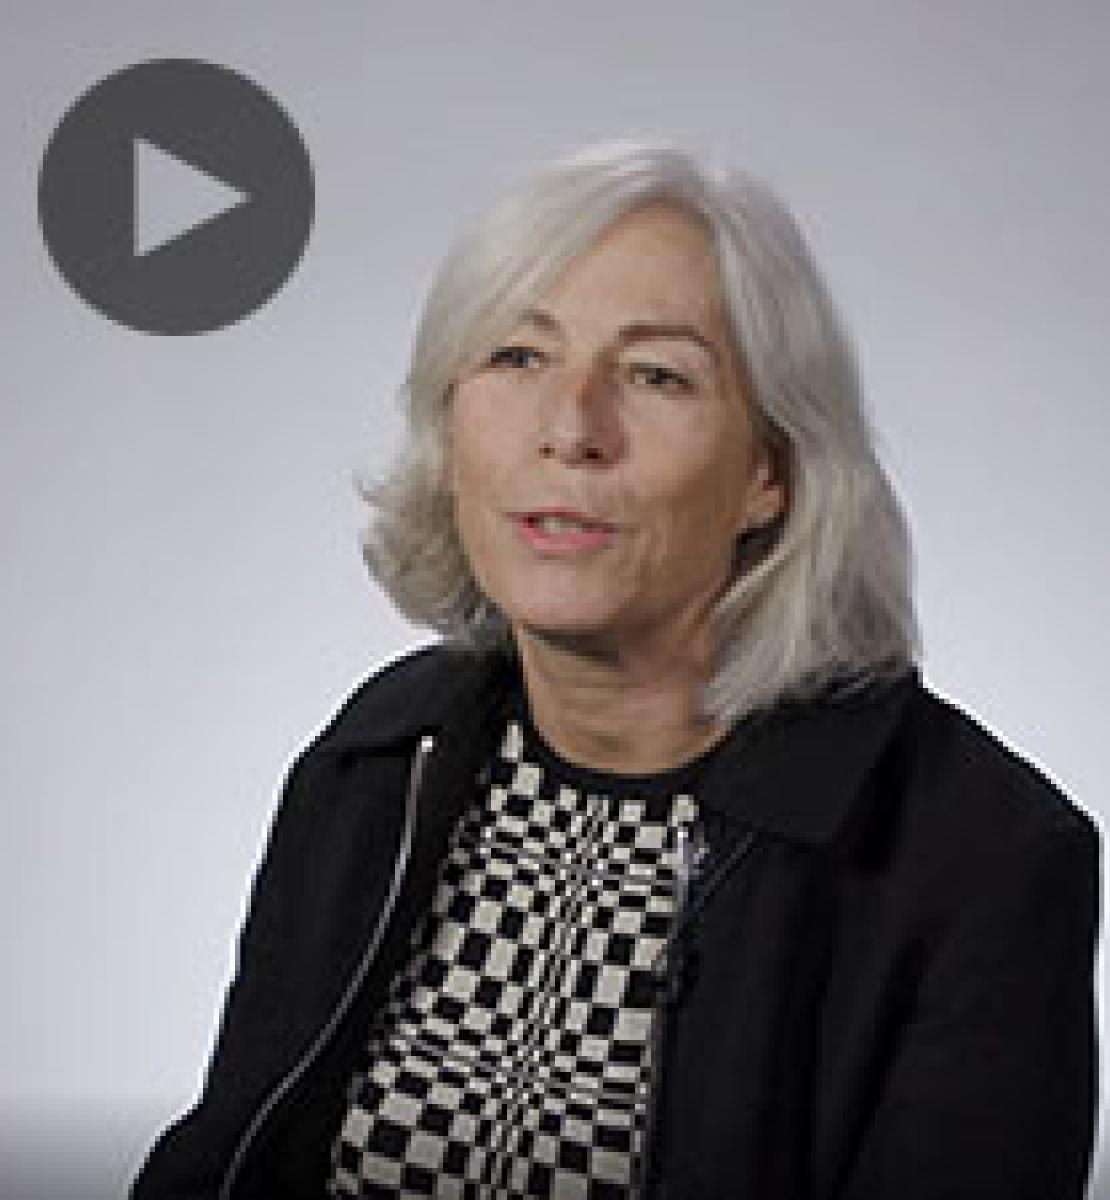 Screenshot from video message shows Resident Coordinator, Fiona McCluney